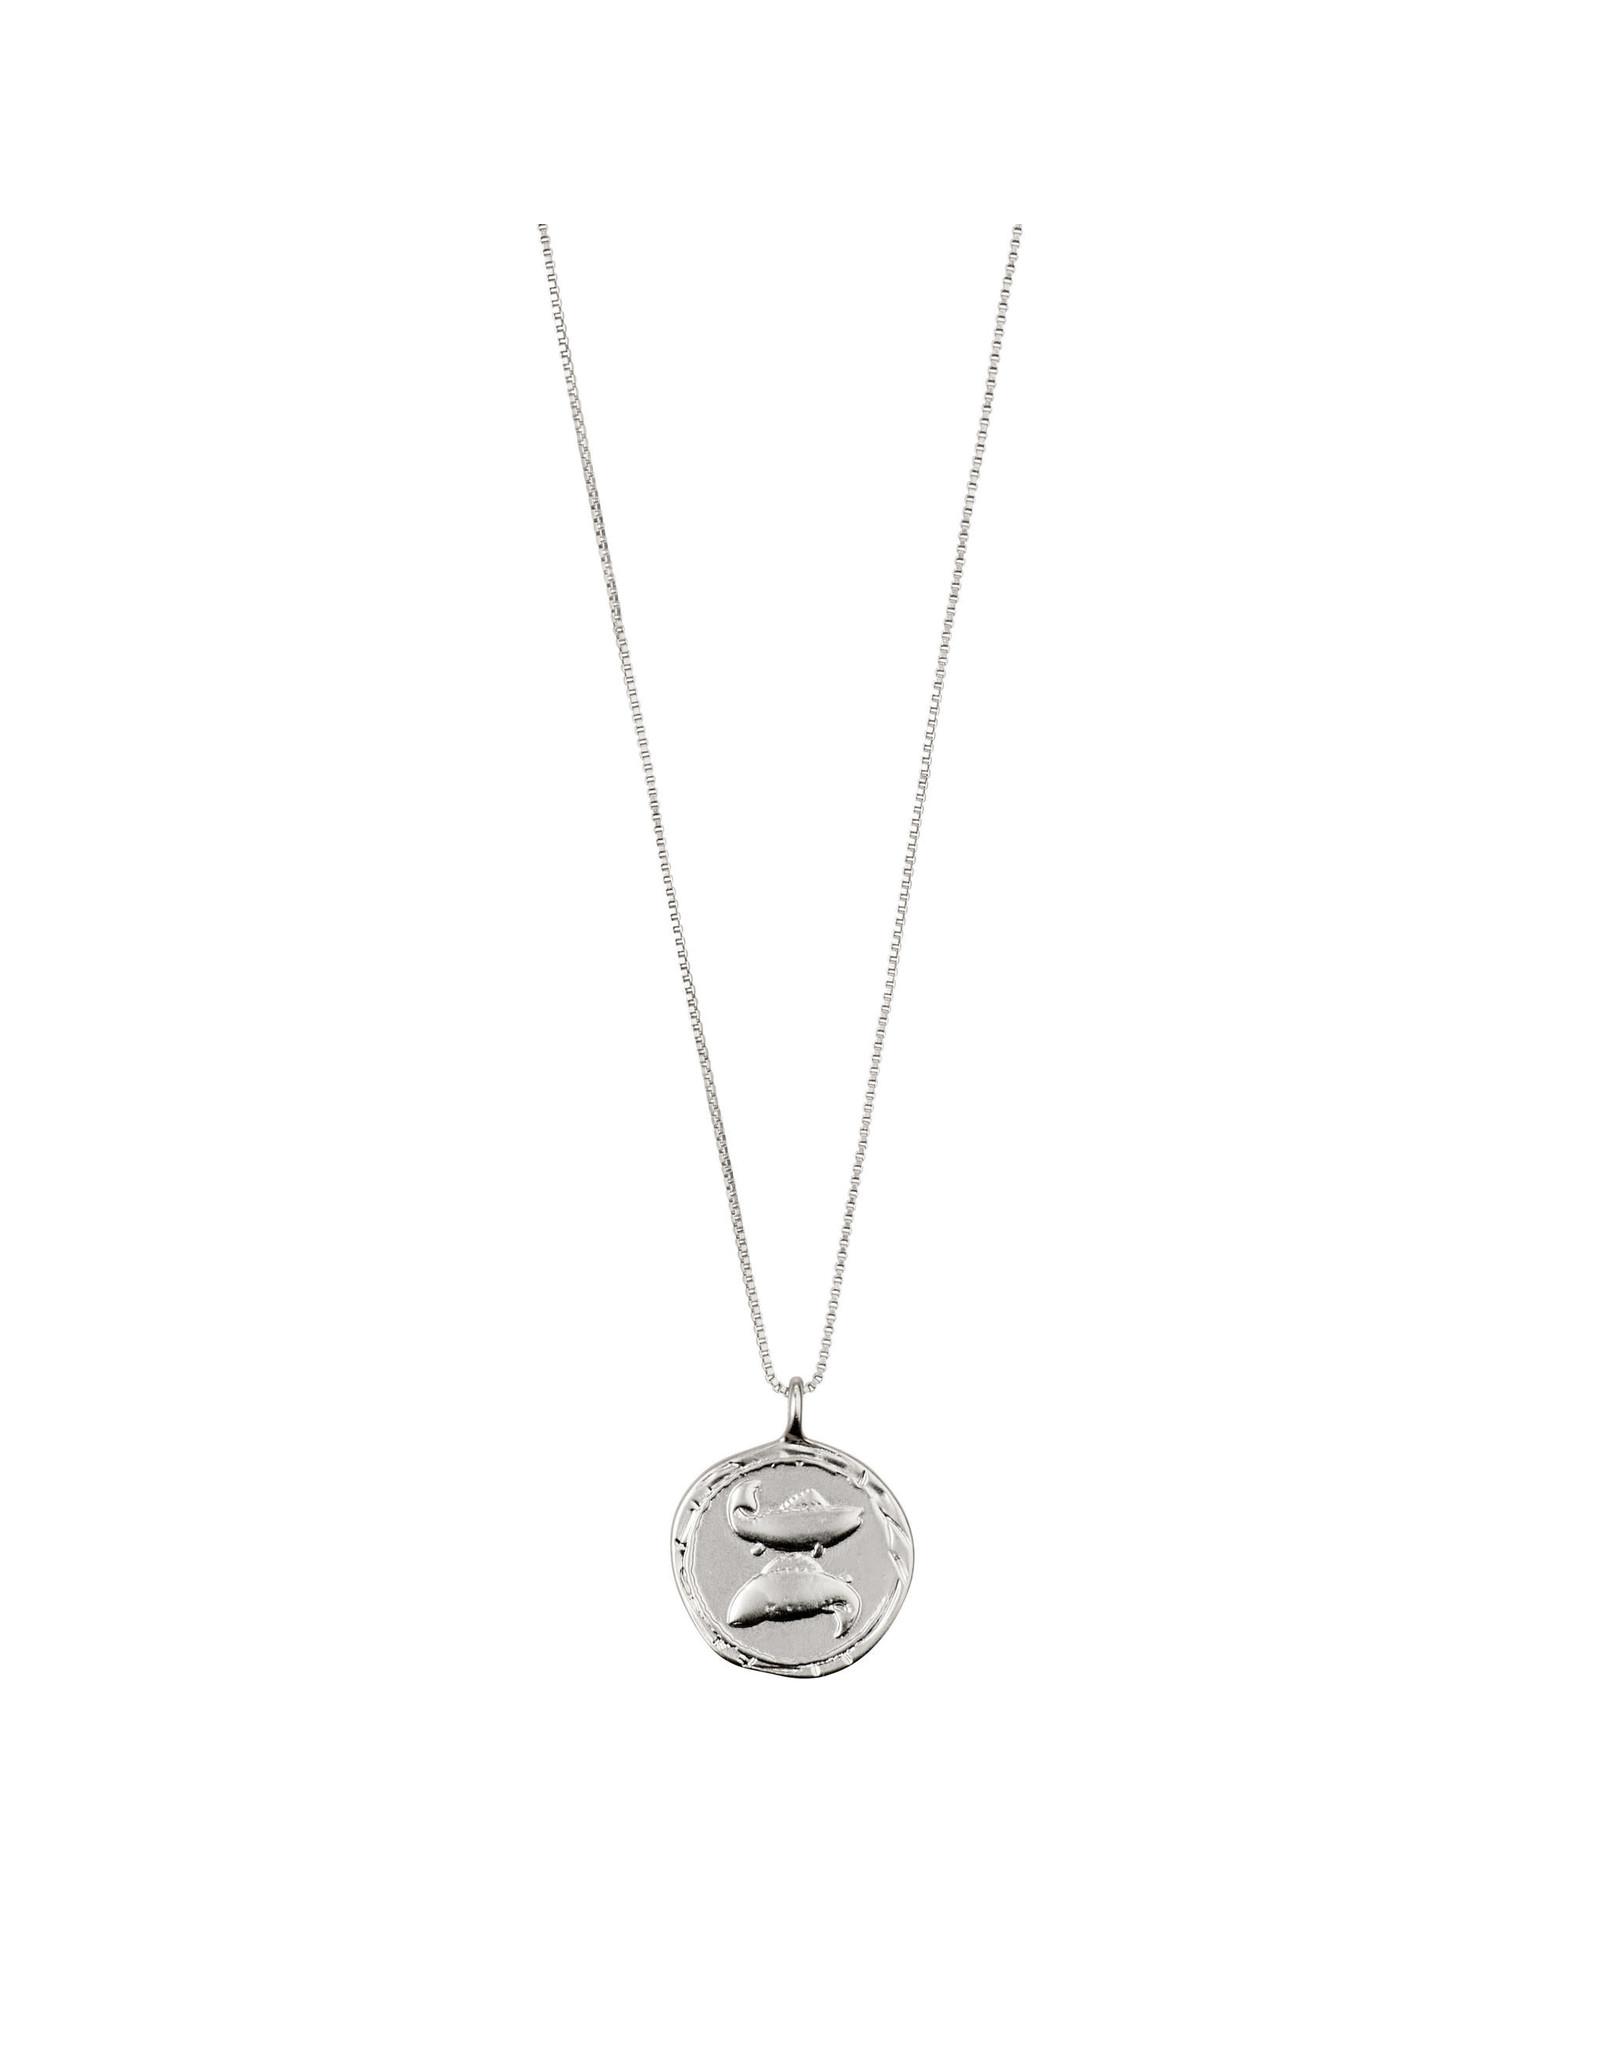 Pilgrim Necklace Pisces Zodiac Sign, Crystal, Silver